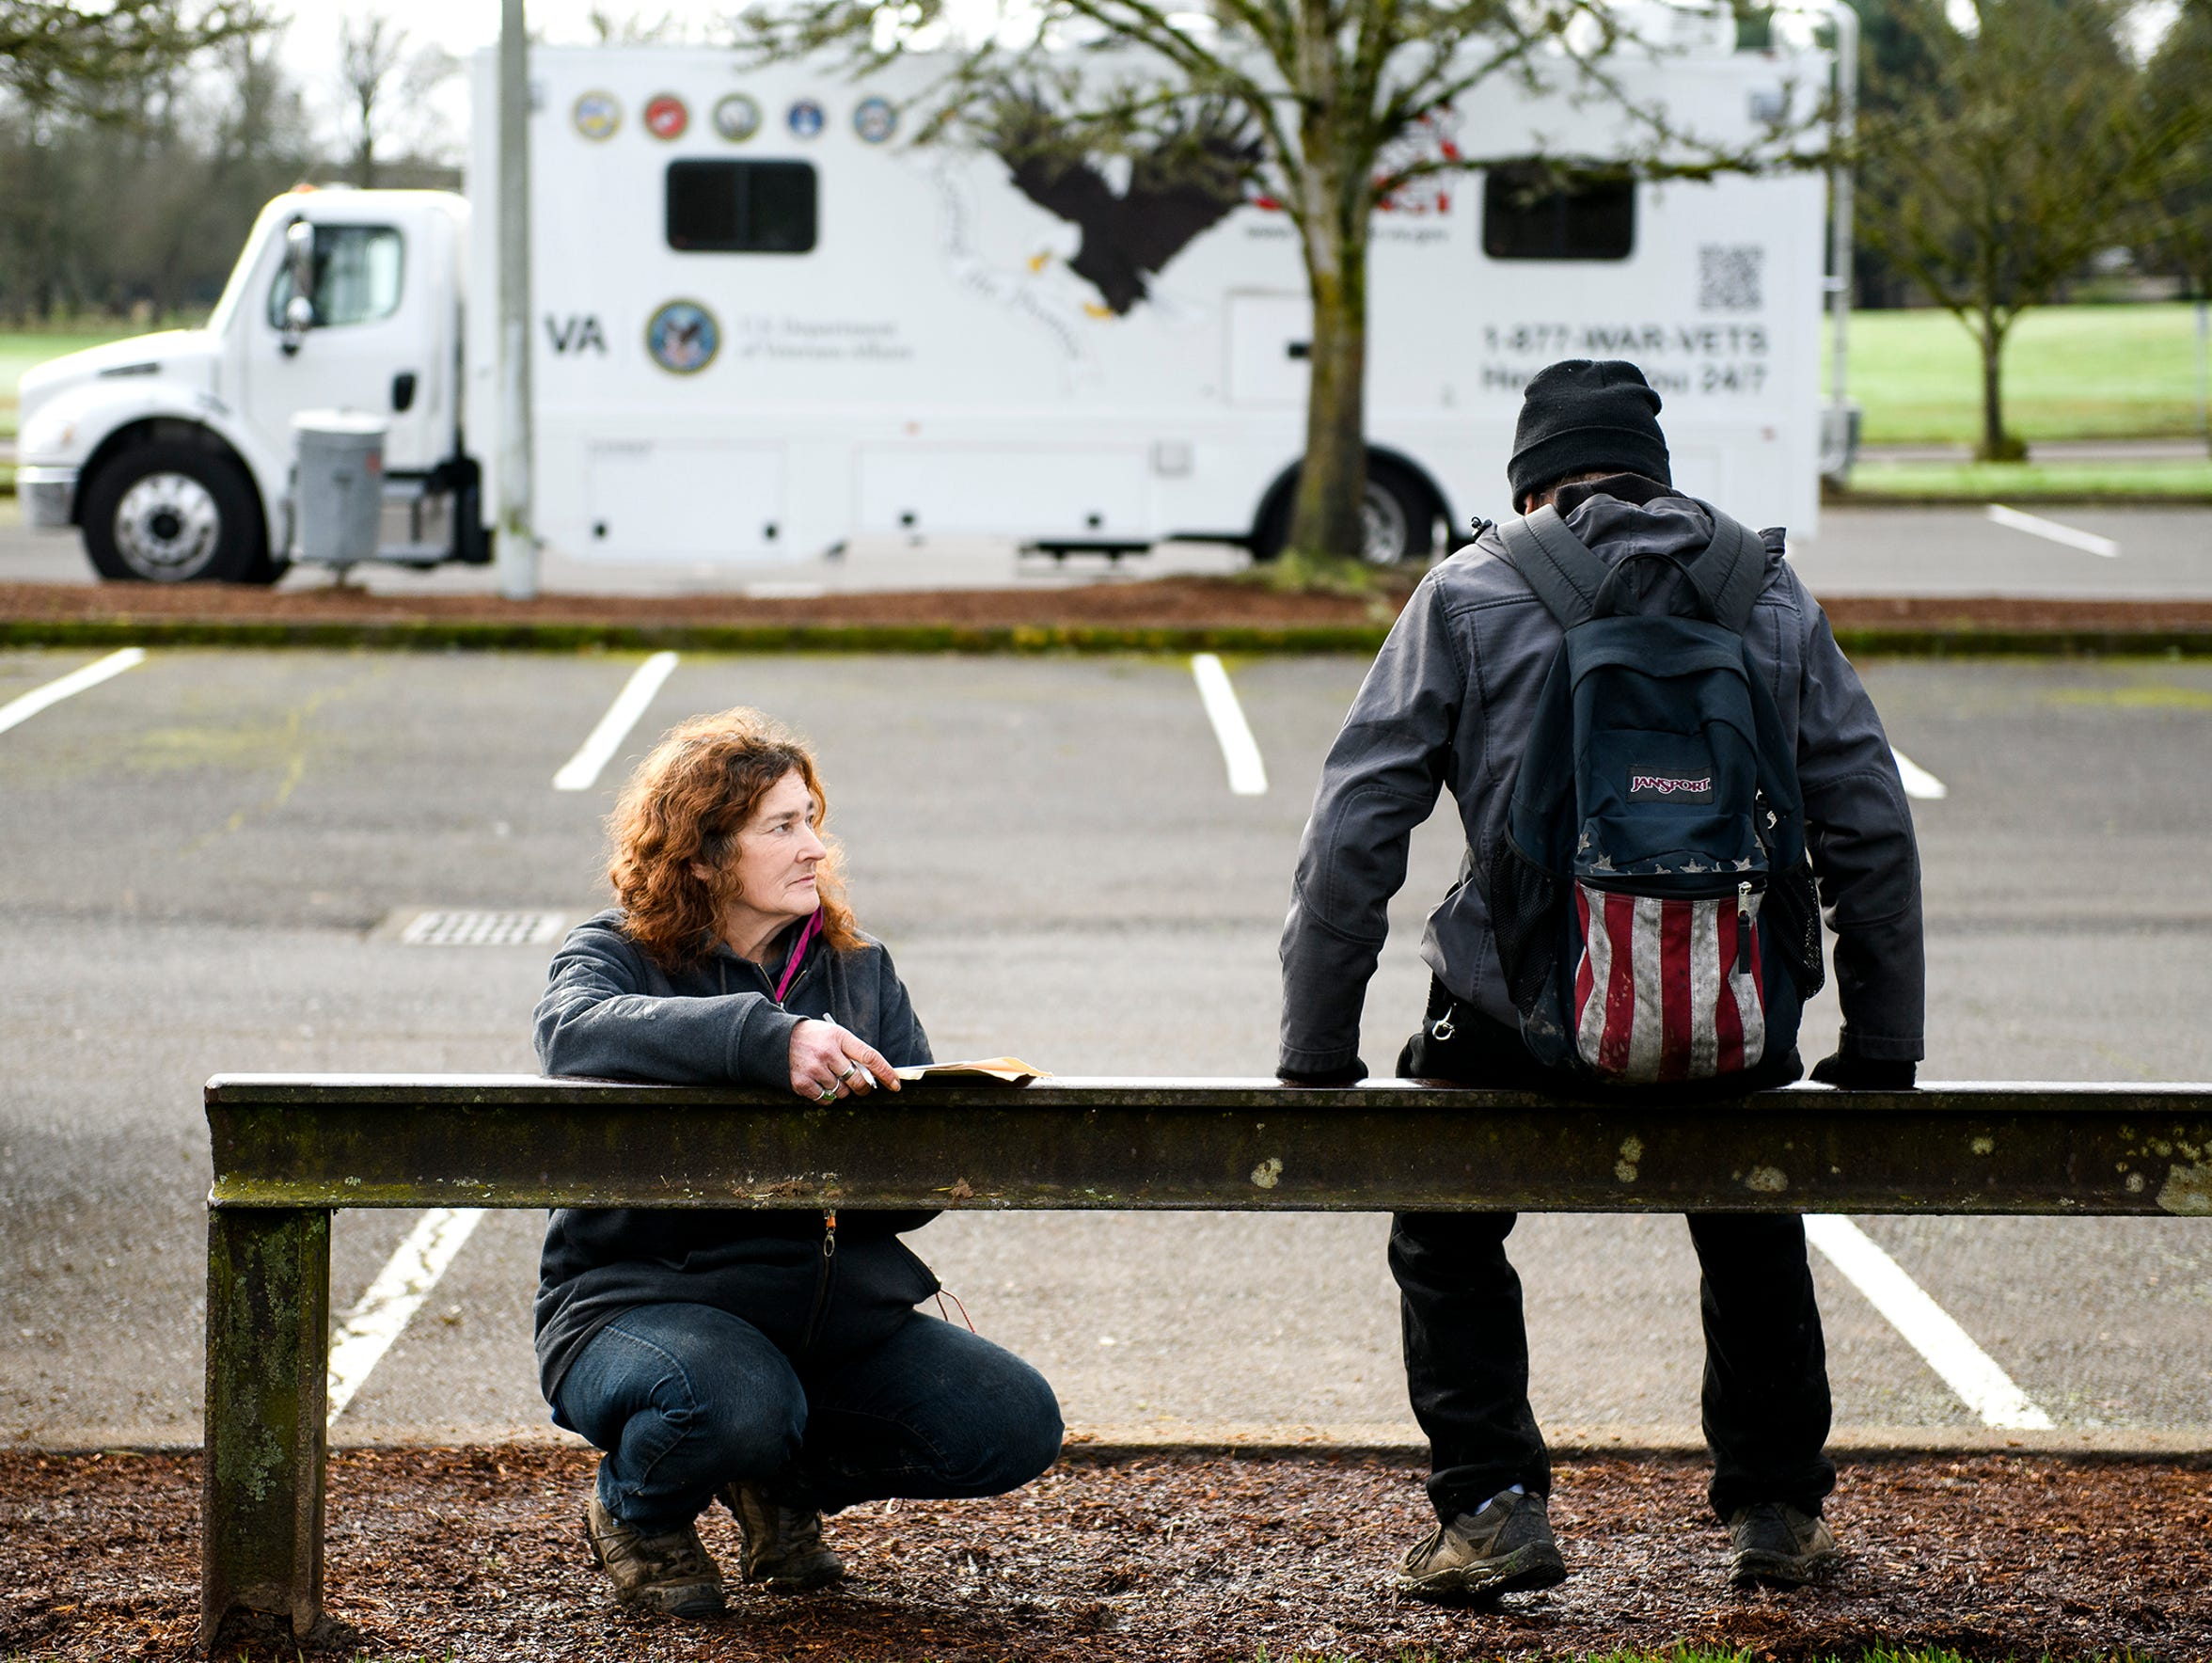 Joan, left, surveys a homeless person at Wallace Marine